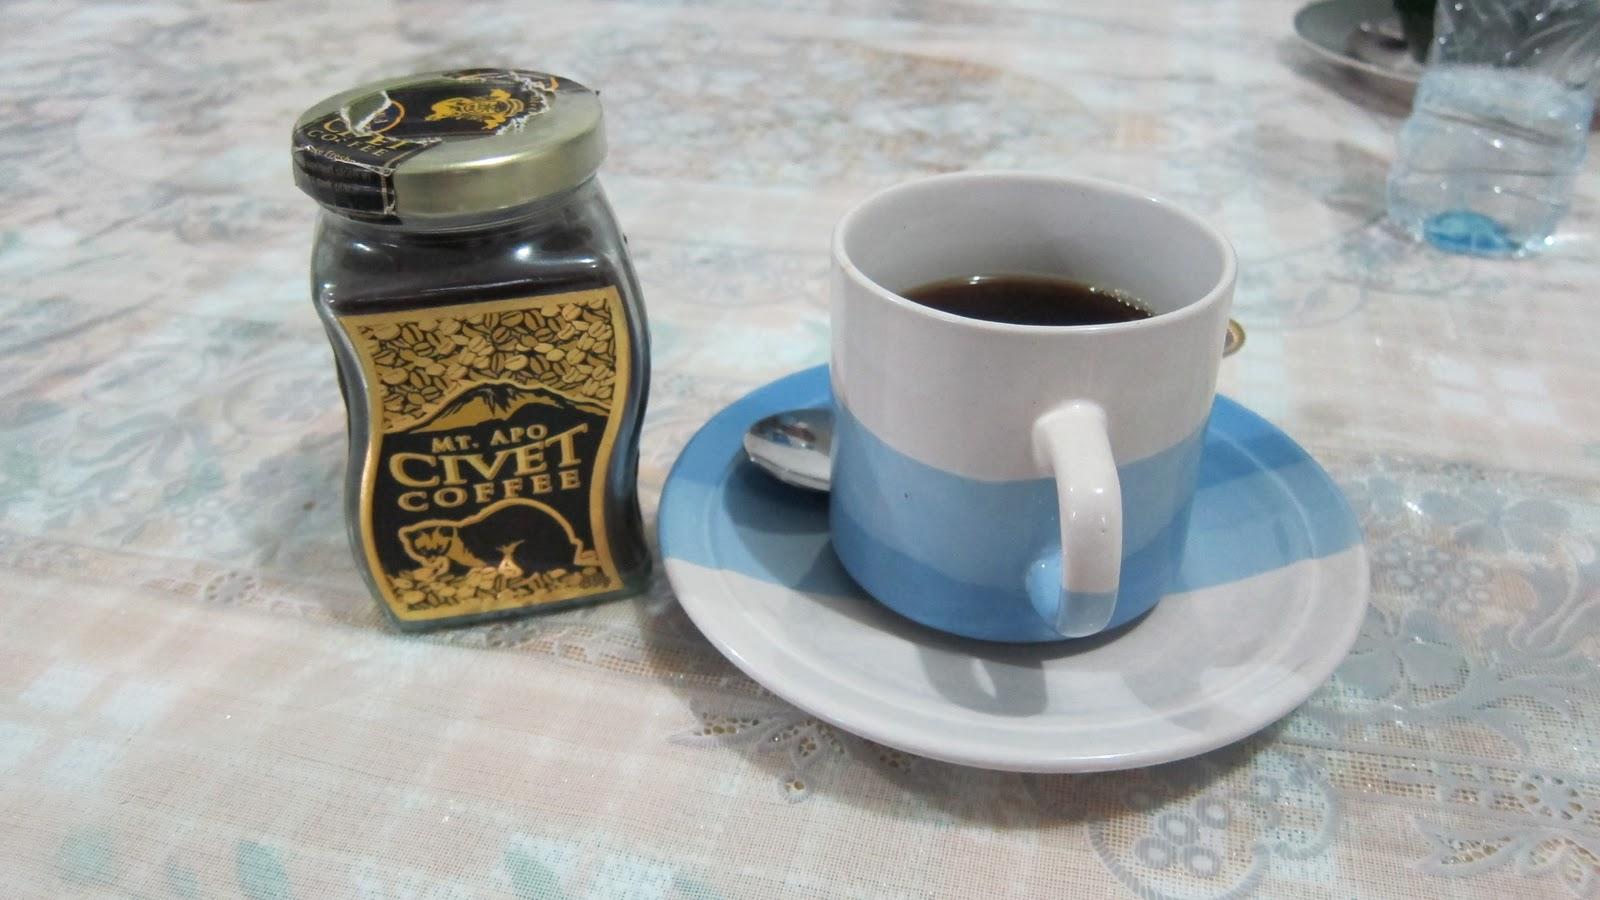 Civet coffee process - photo#22